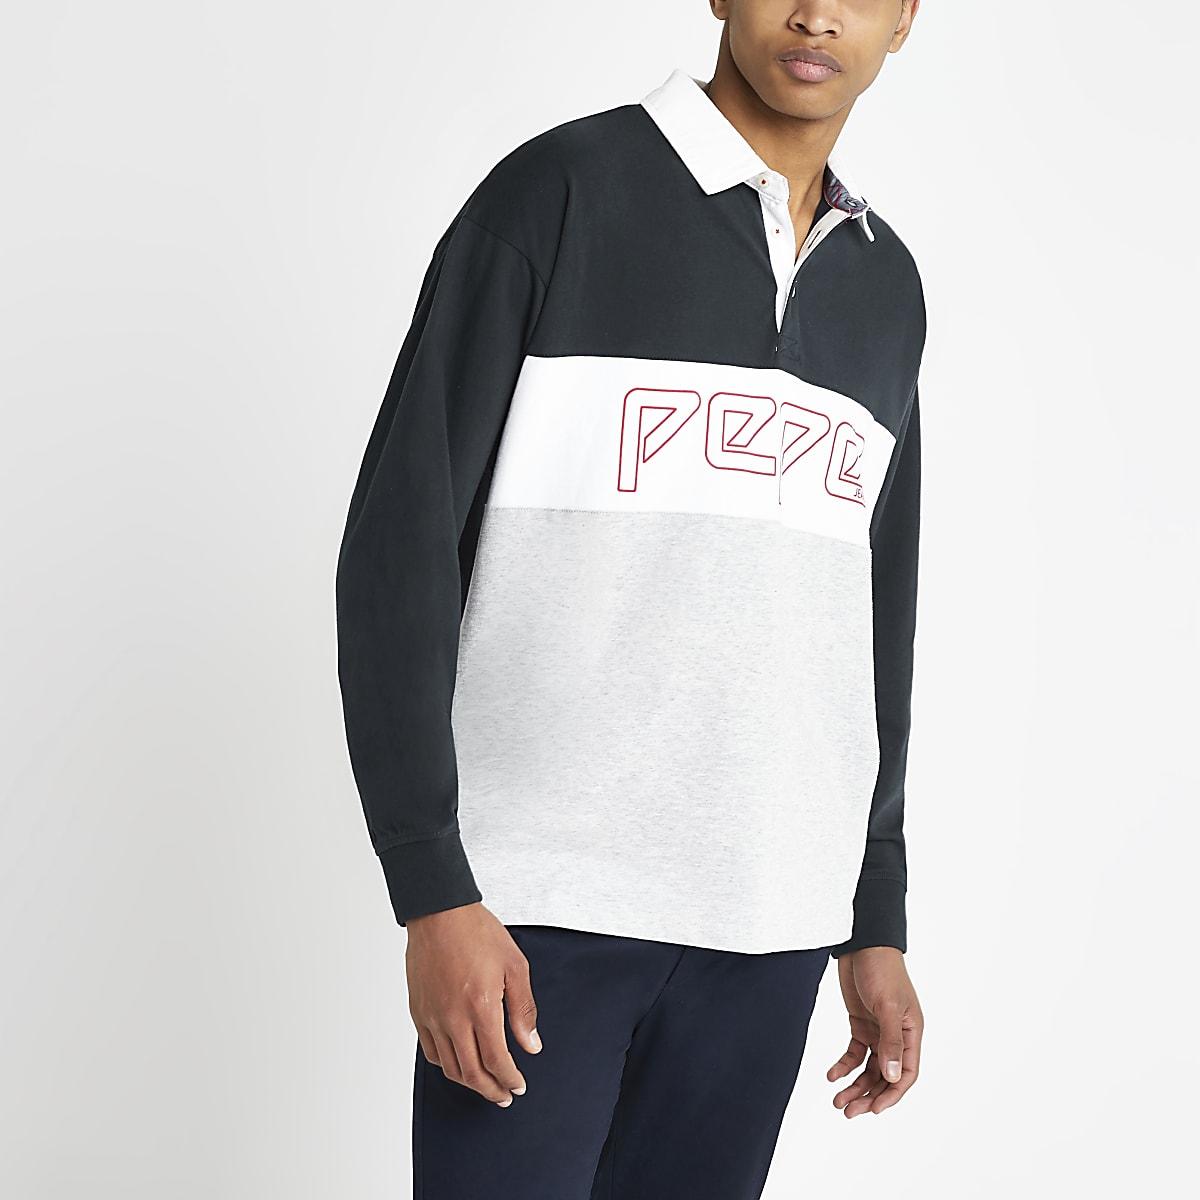 Pepe Jeans grey long sleeve polo shirt